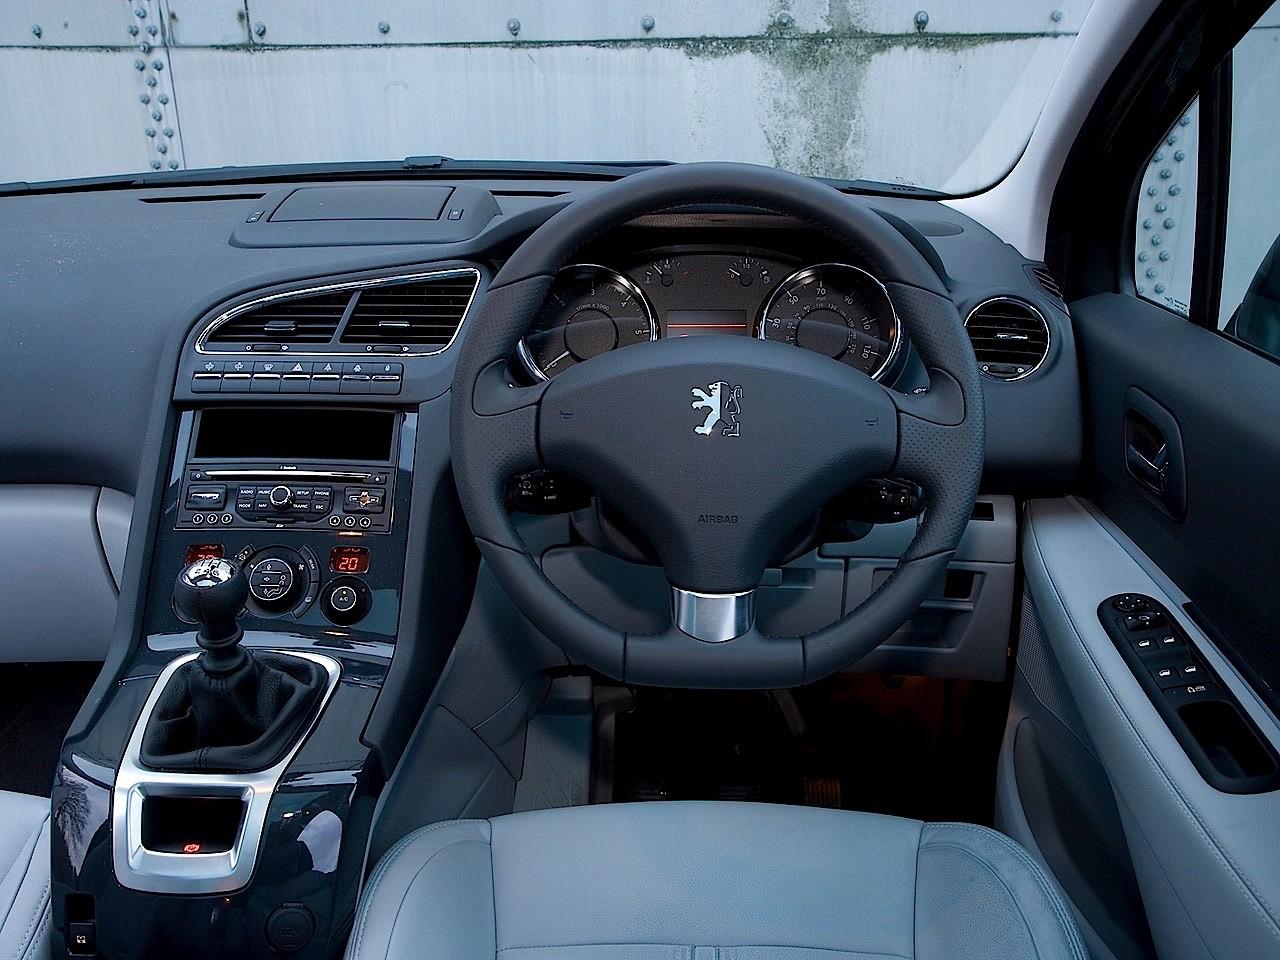 Peugeot 5008 Specs 2009 2010 2011 2012 2013